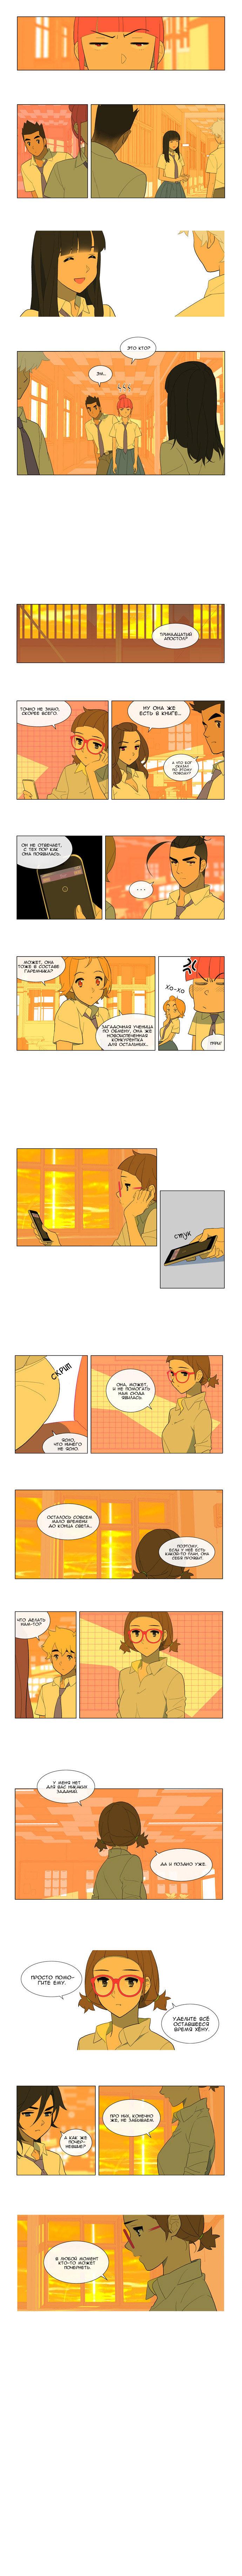 https://r1.ninemanga.com/comics/pic2/32/21344/207421/142784837243.jpg Page 1